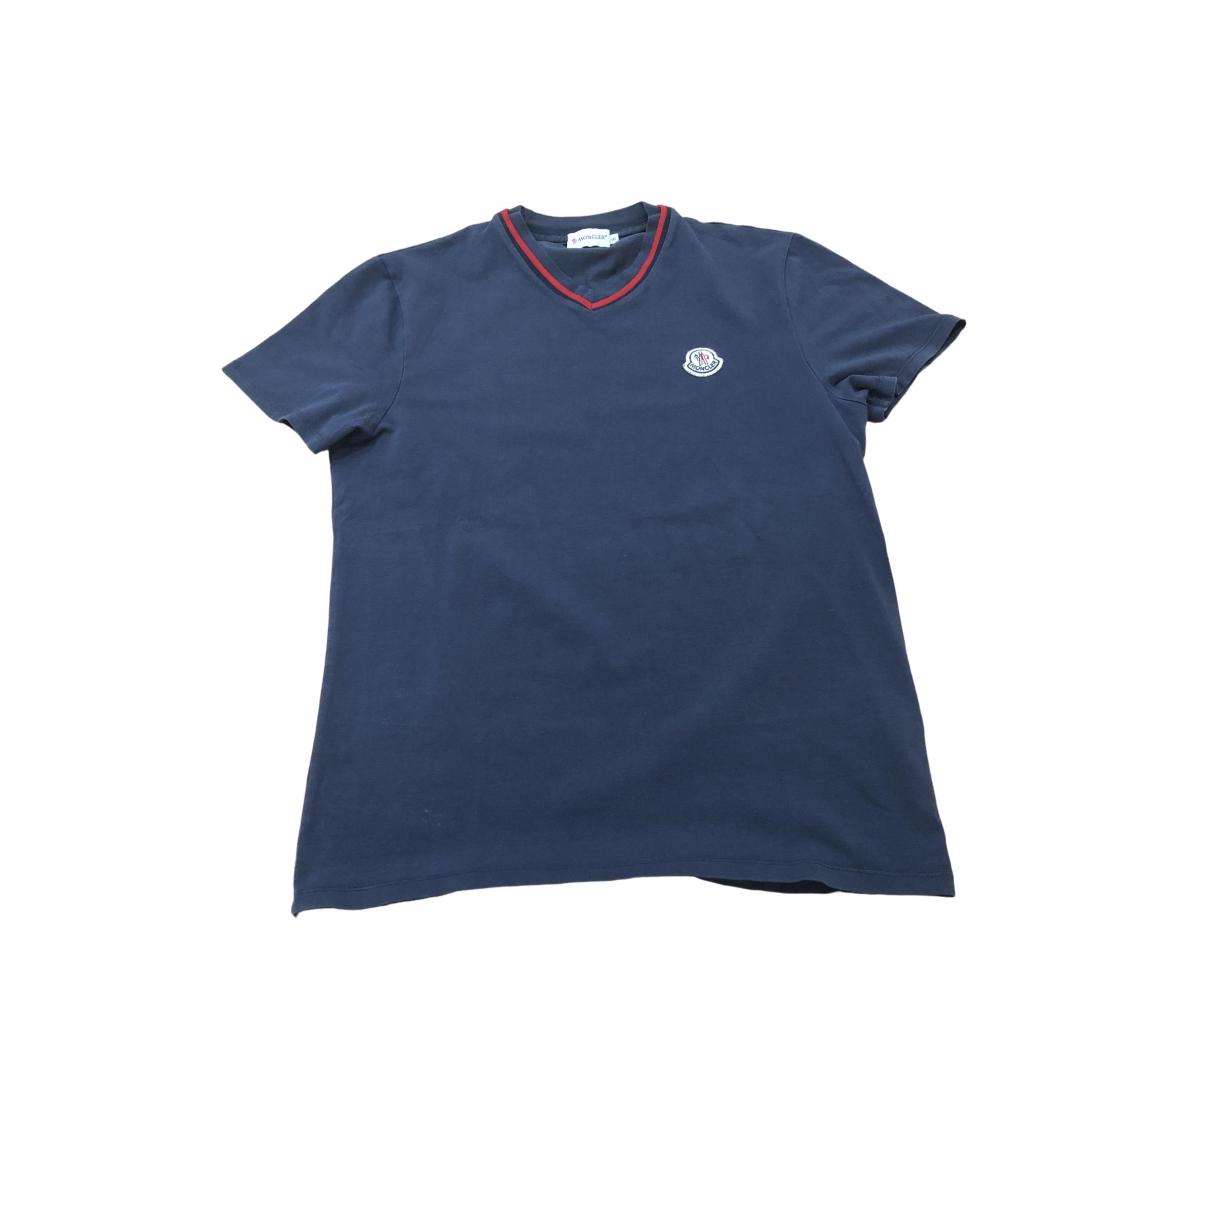 Moncler \N Blue Cotton T-shirts for Men S International